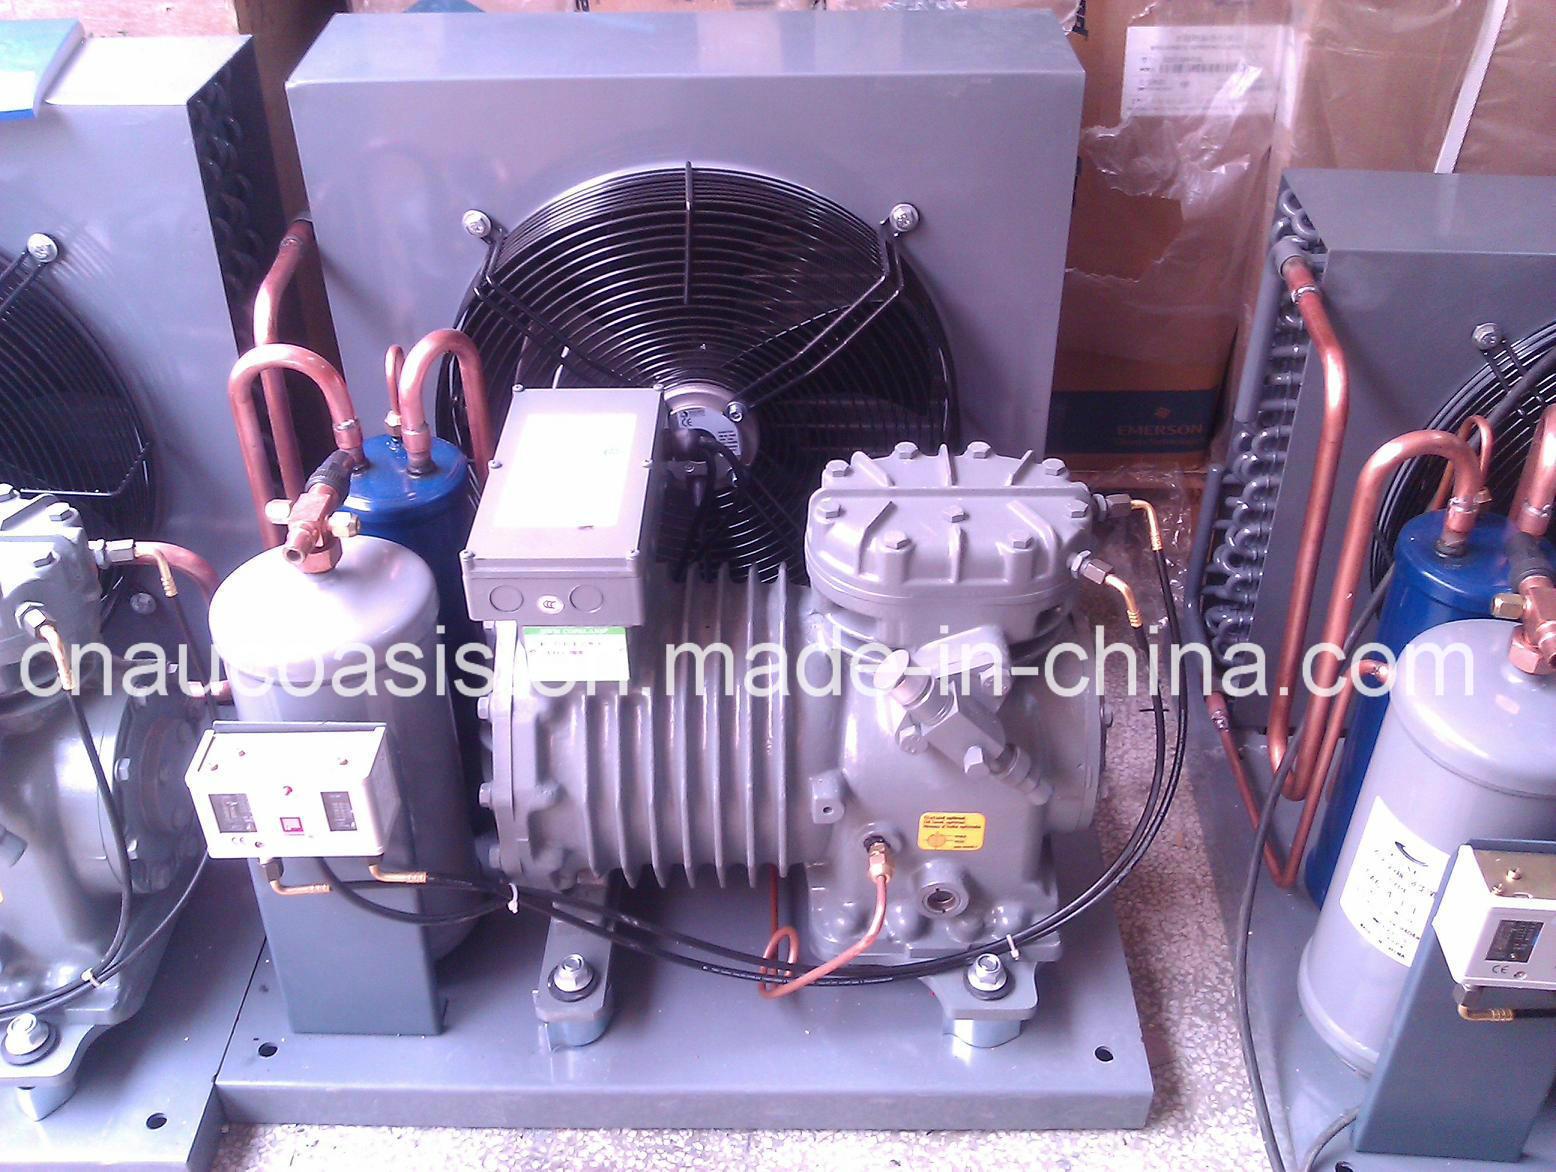 Dwm Copeland Semi-Hermetic Condensing Units Refrigeration for Freezer / Cold Storage